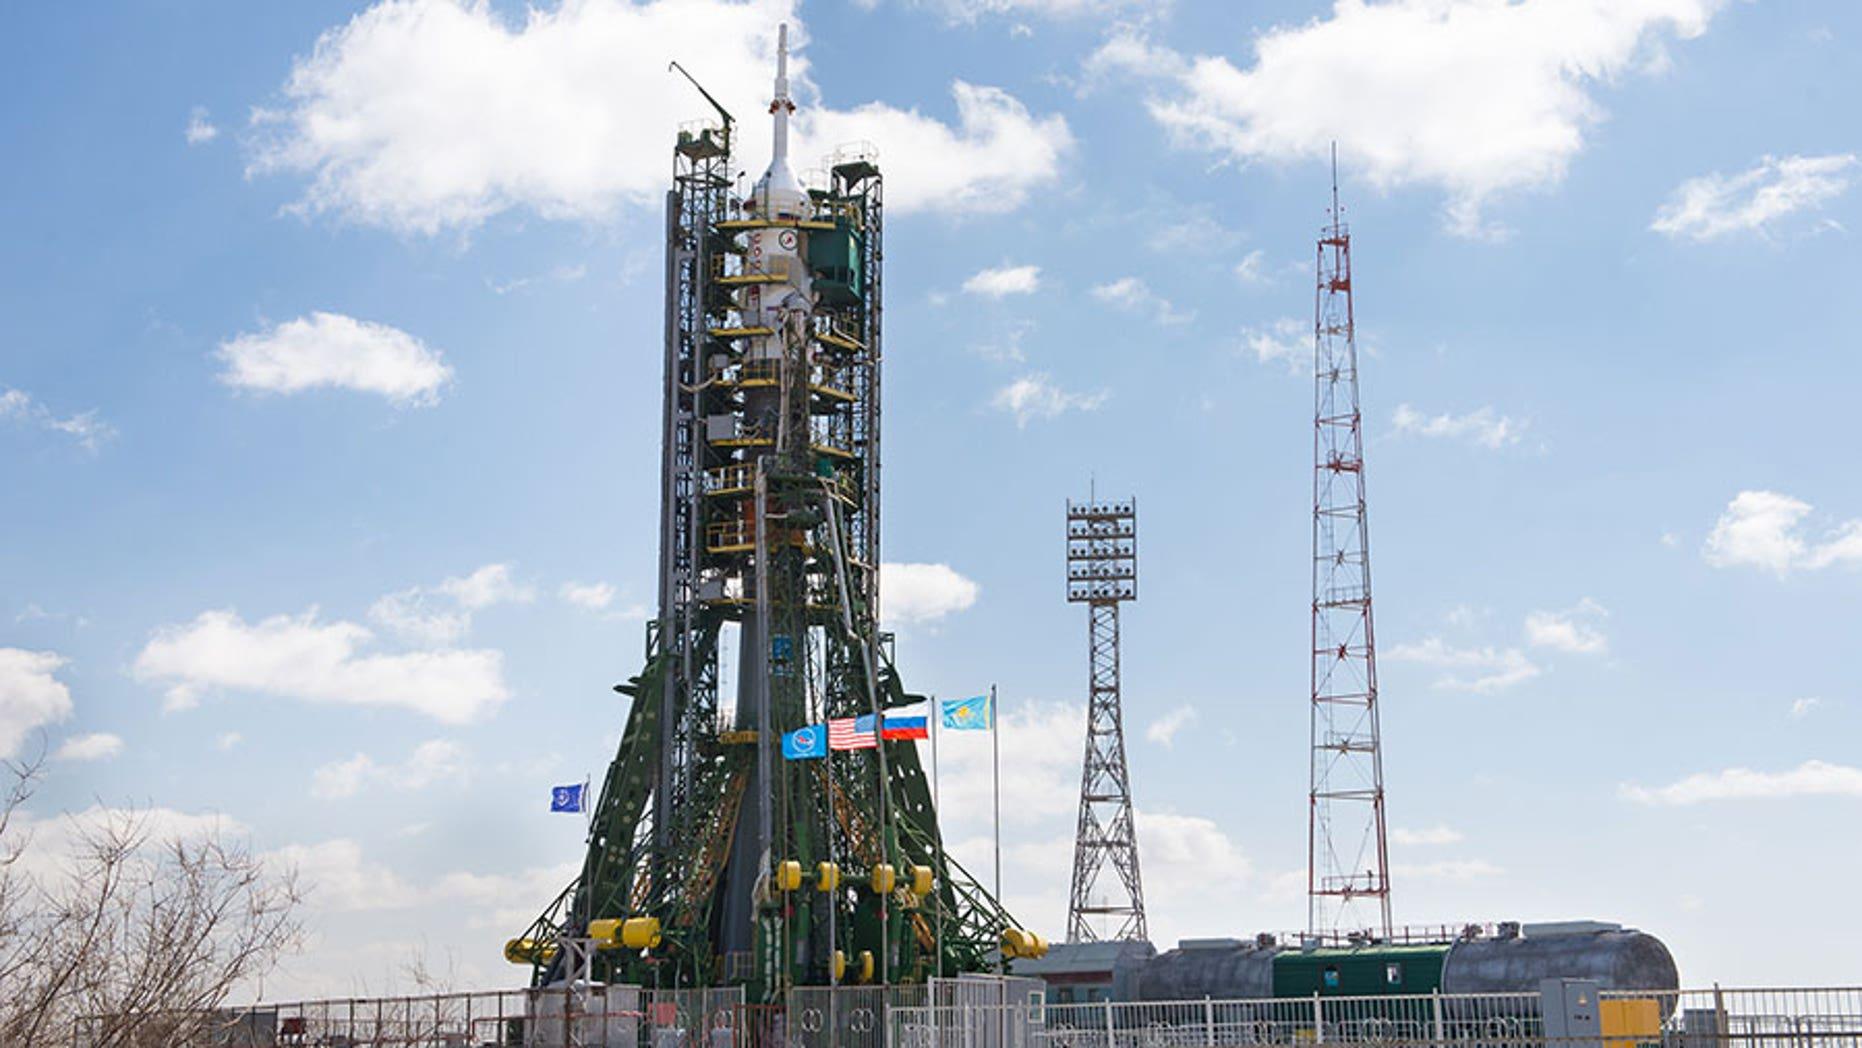 The Soyuz TMA-20M Rocket Ready for Liftoff